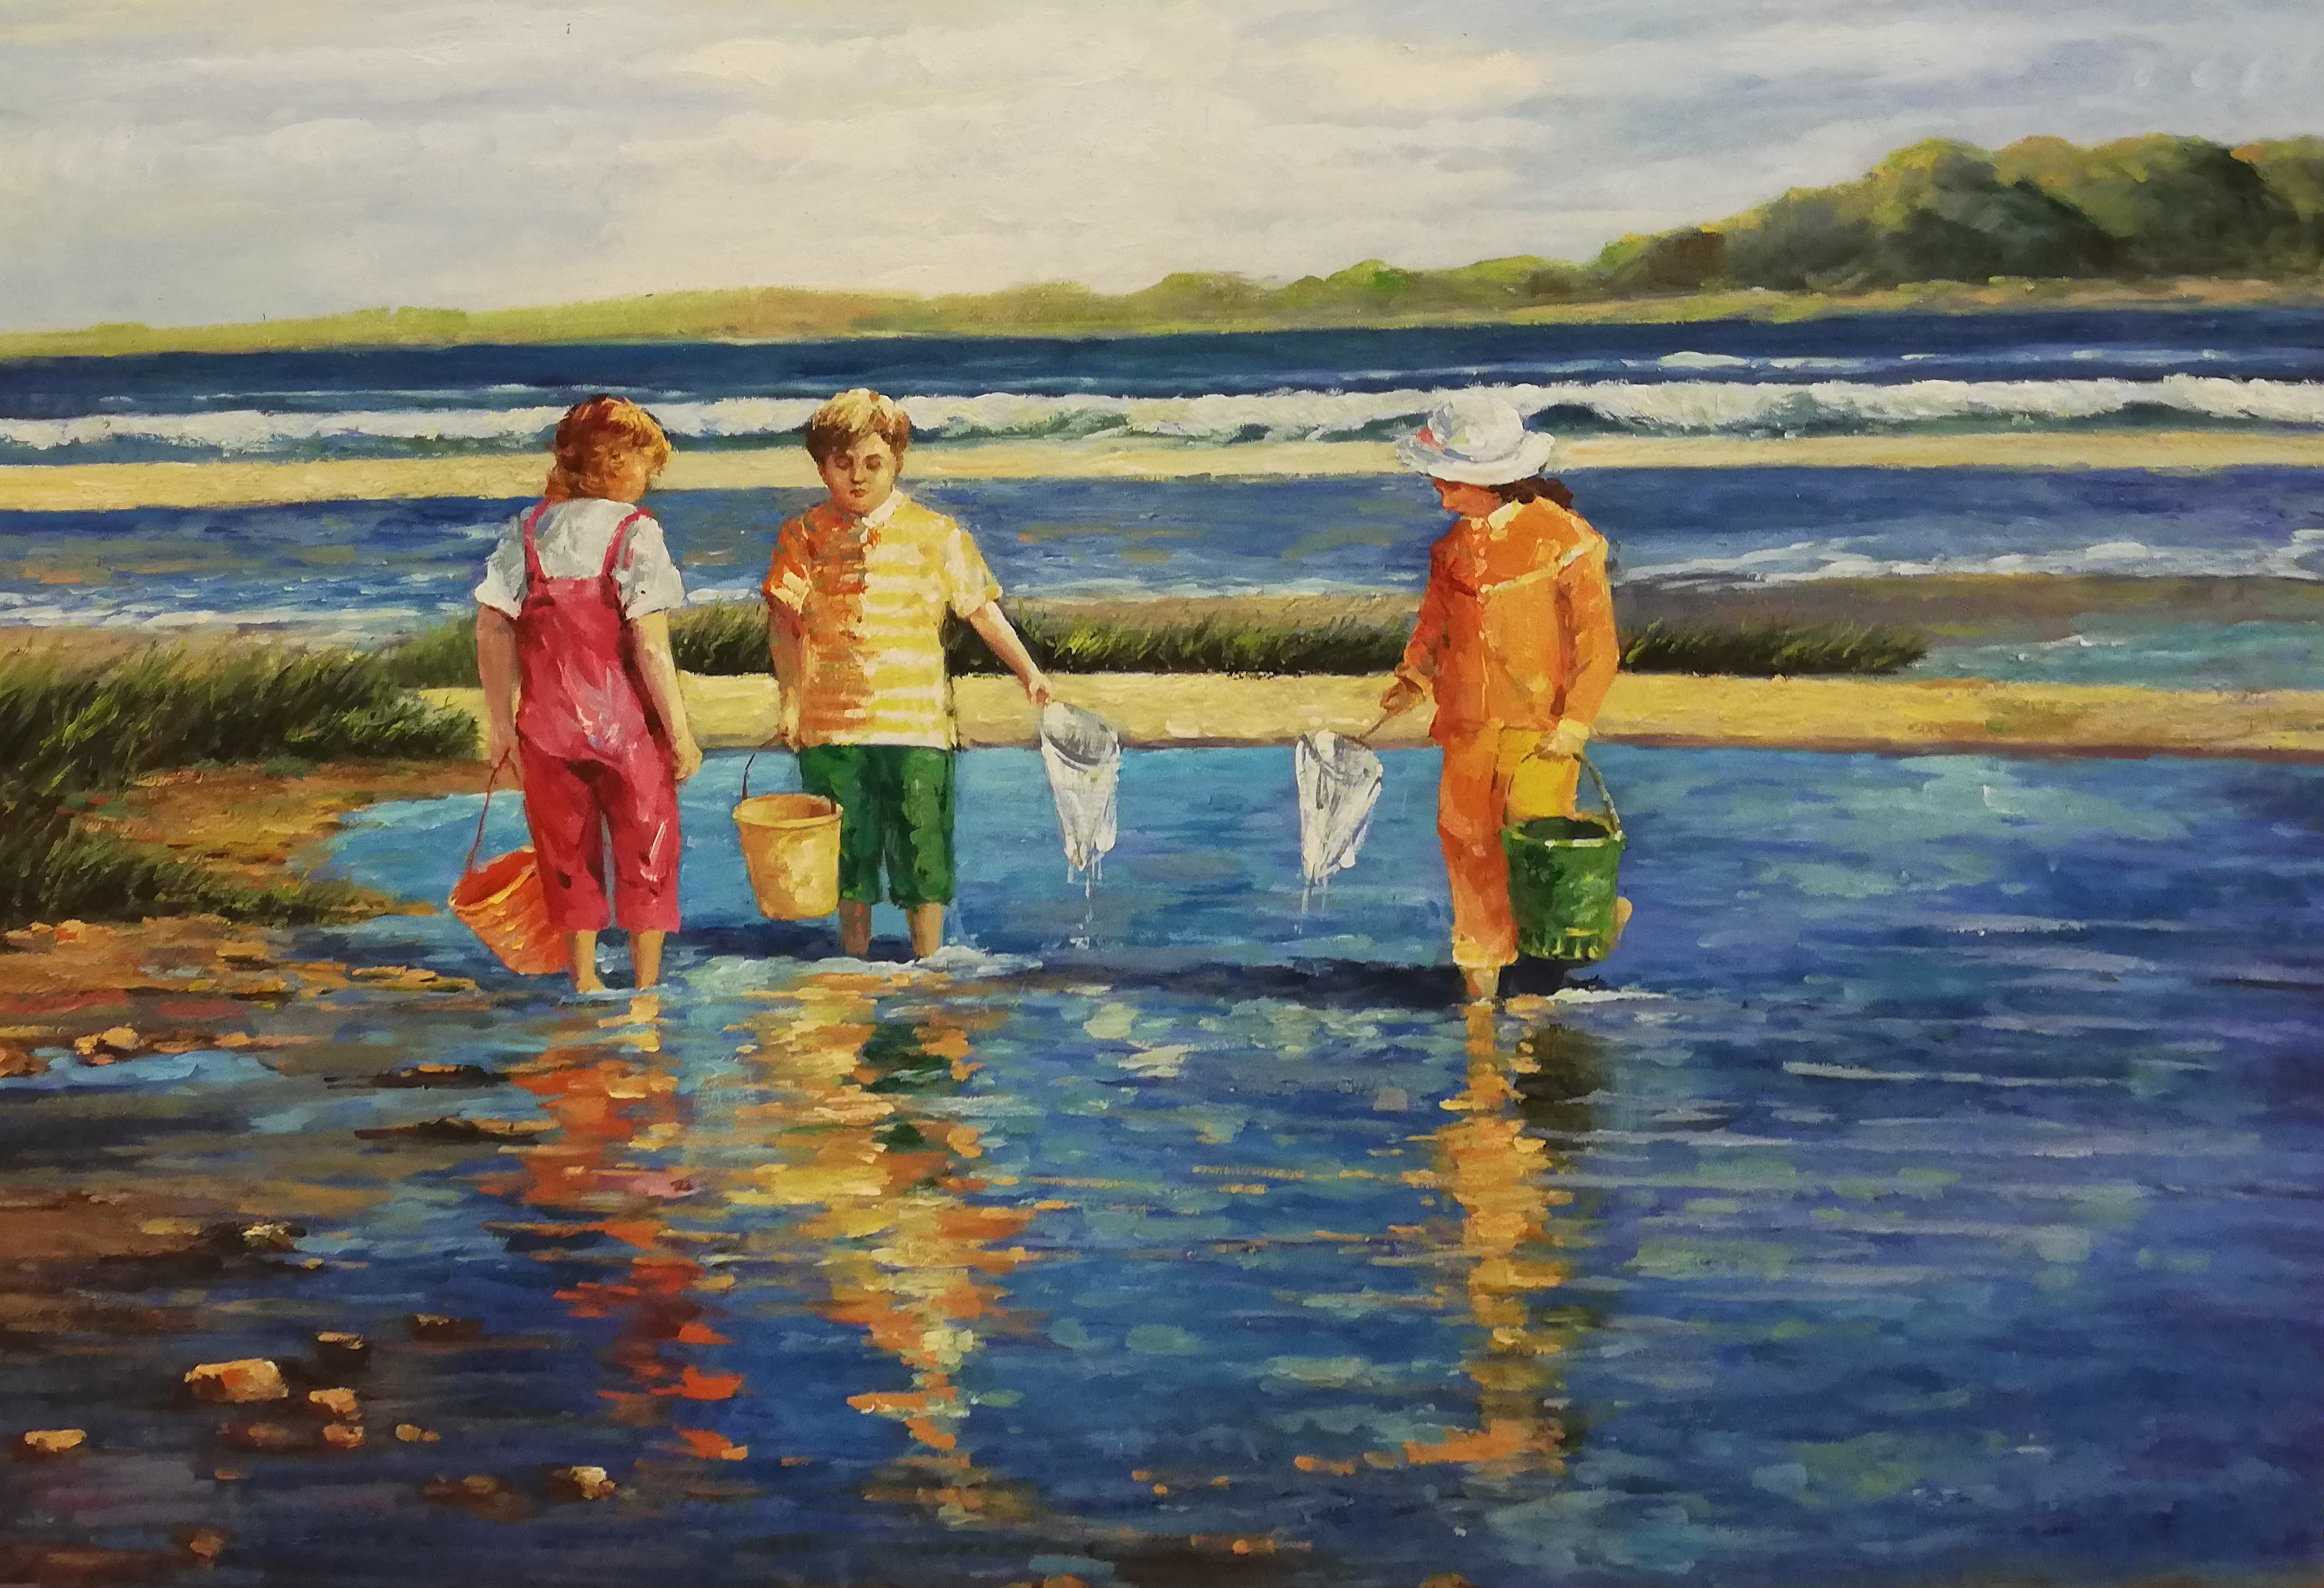 krabbetjes vangen schilderij strand